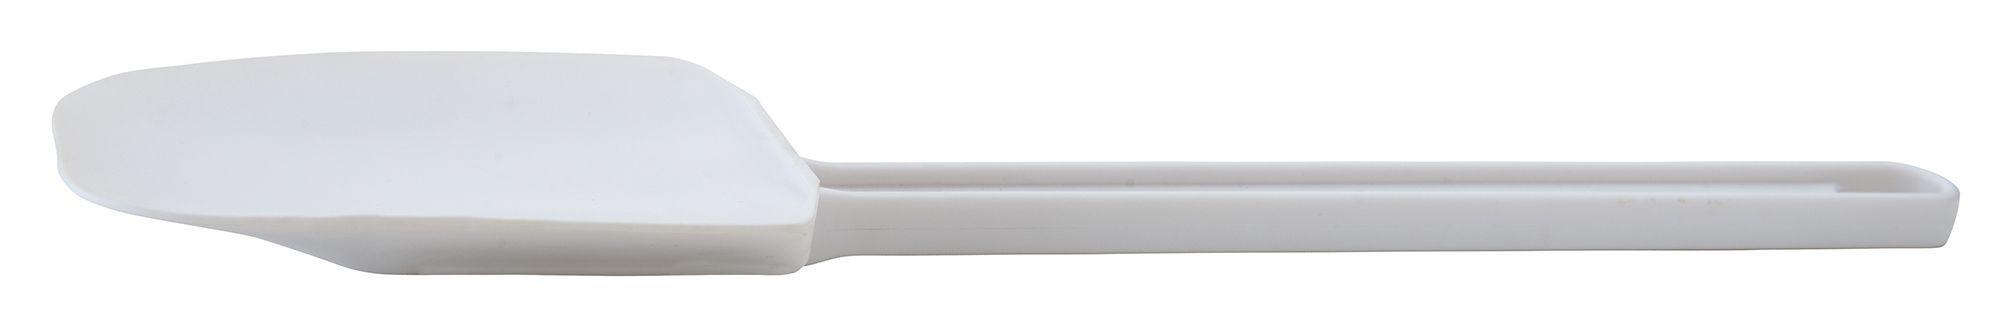 "Winco PSGE-14 14"" Bowl Shaped Plastic Scraper"